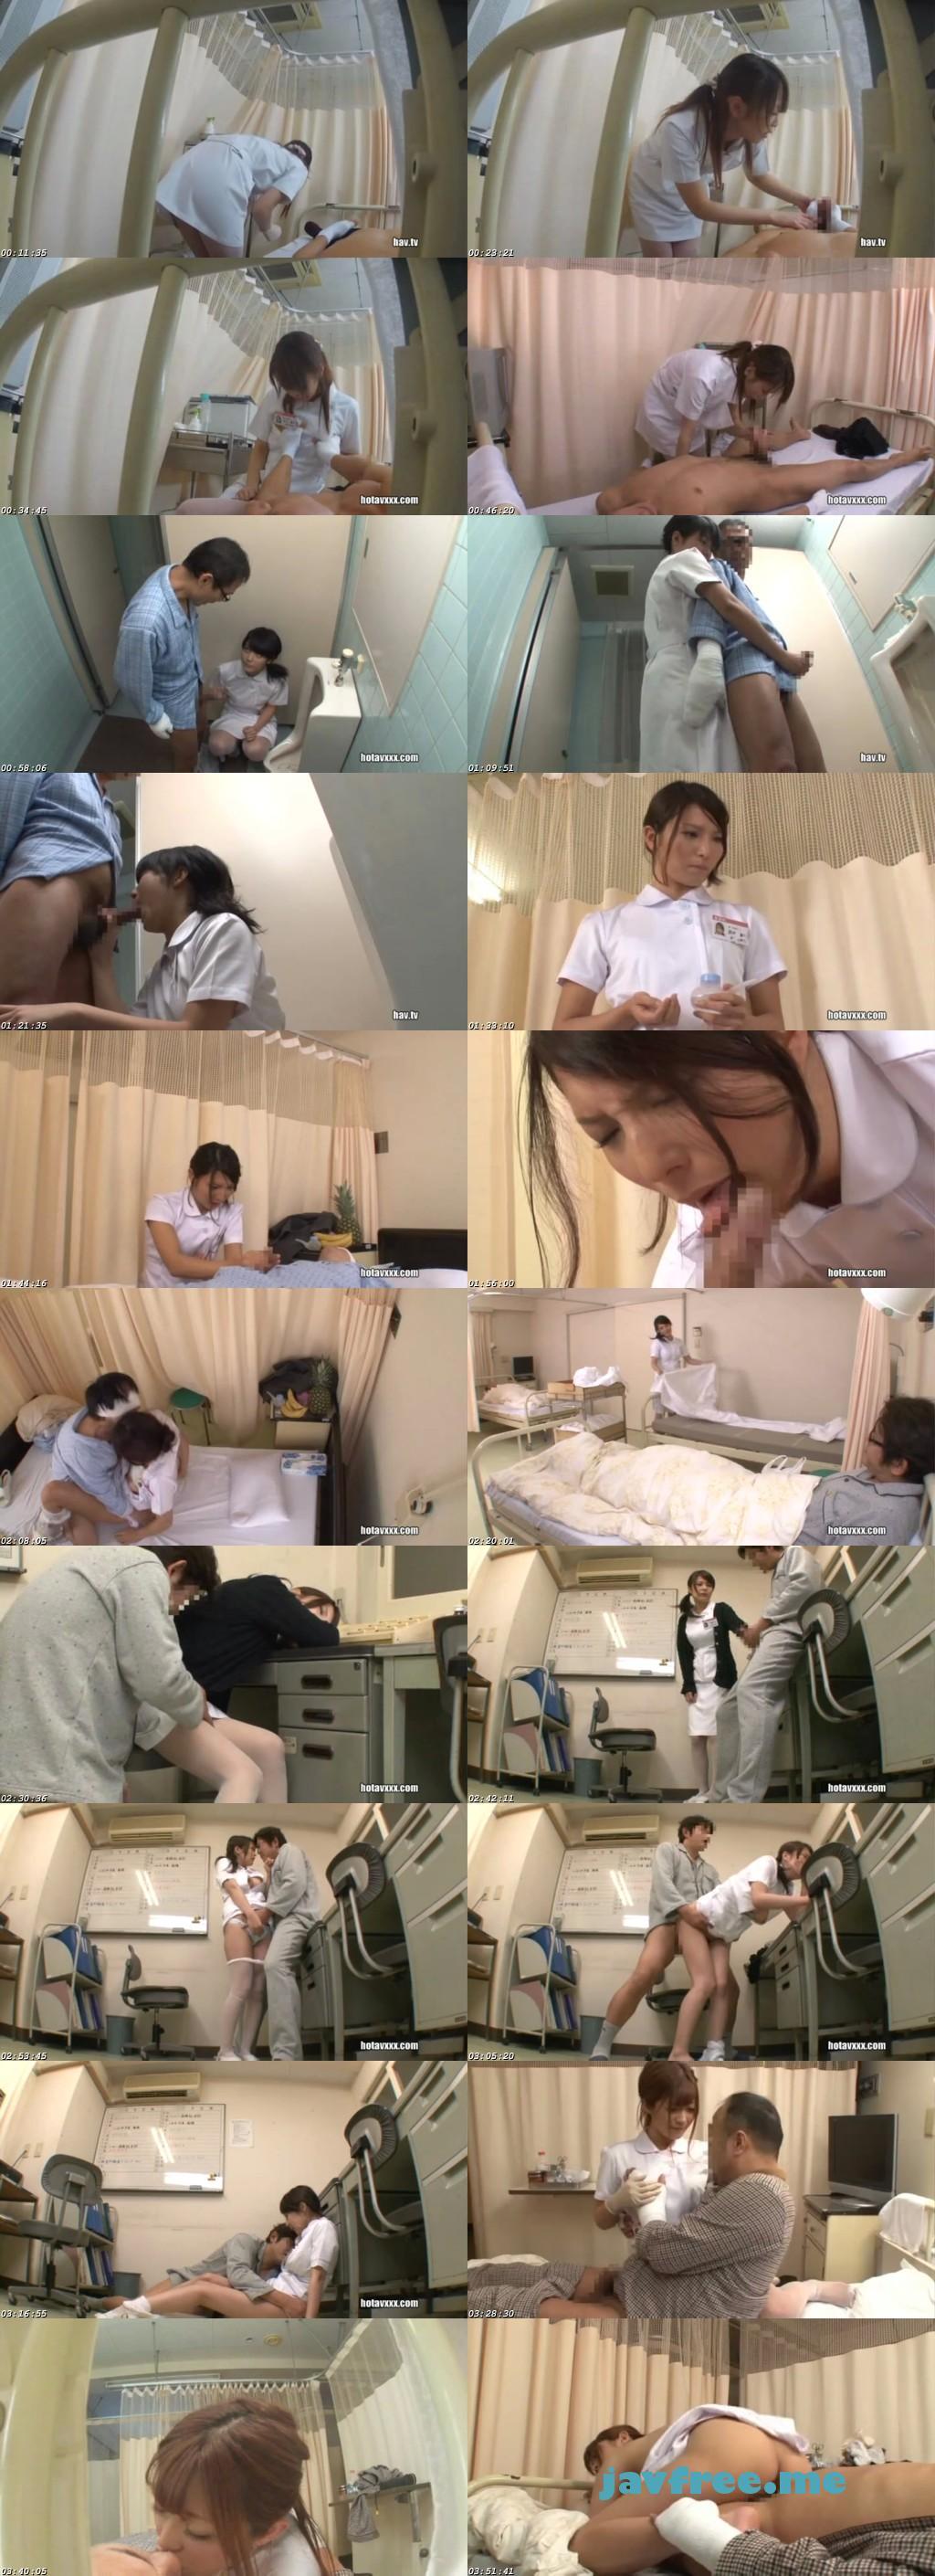 [DANDY-324] 「ワザと看護師にせんずりを見せつけたらヤられるか?」 VOL.7 - image DANDY-324 on https://javfree.me